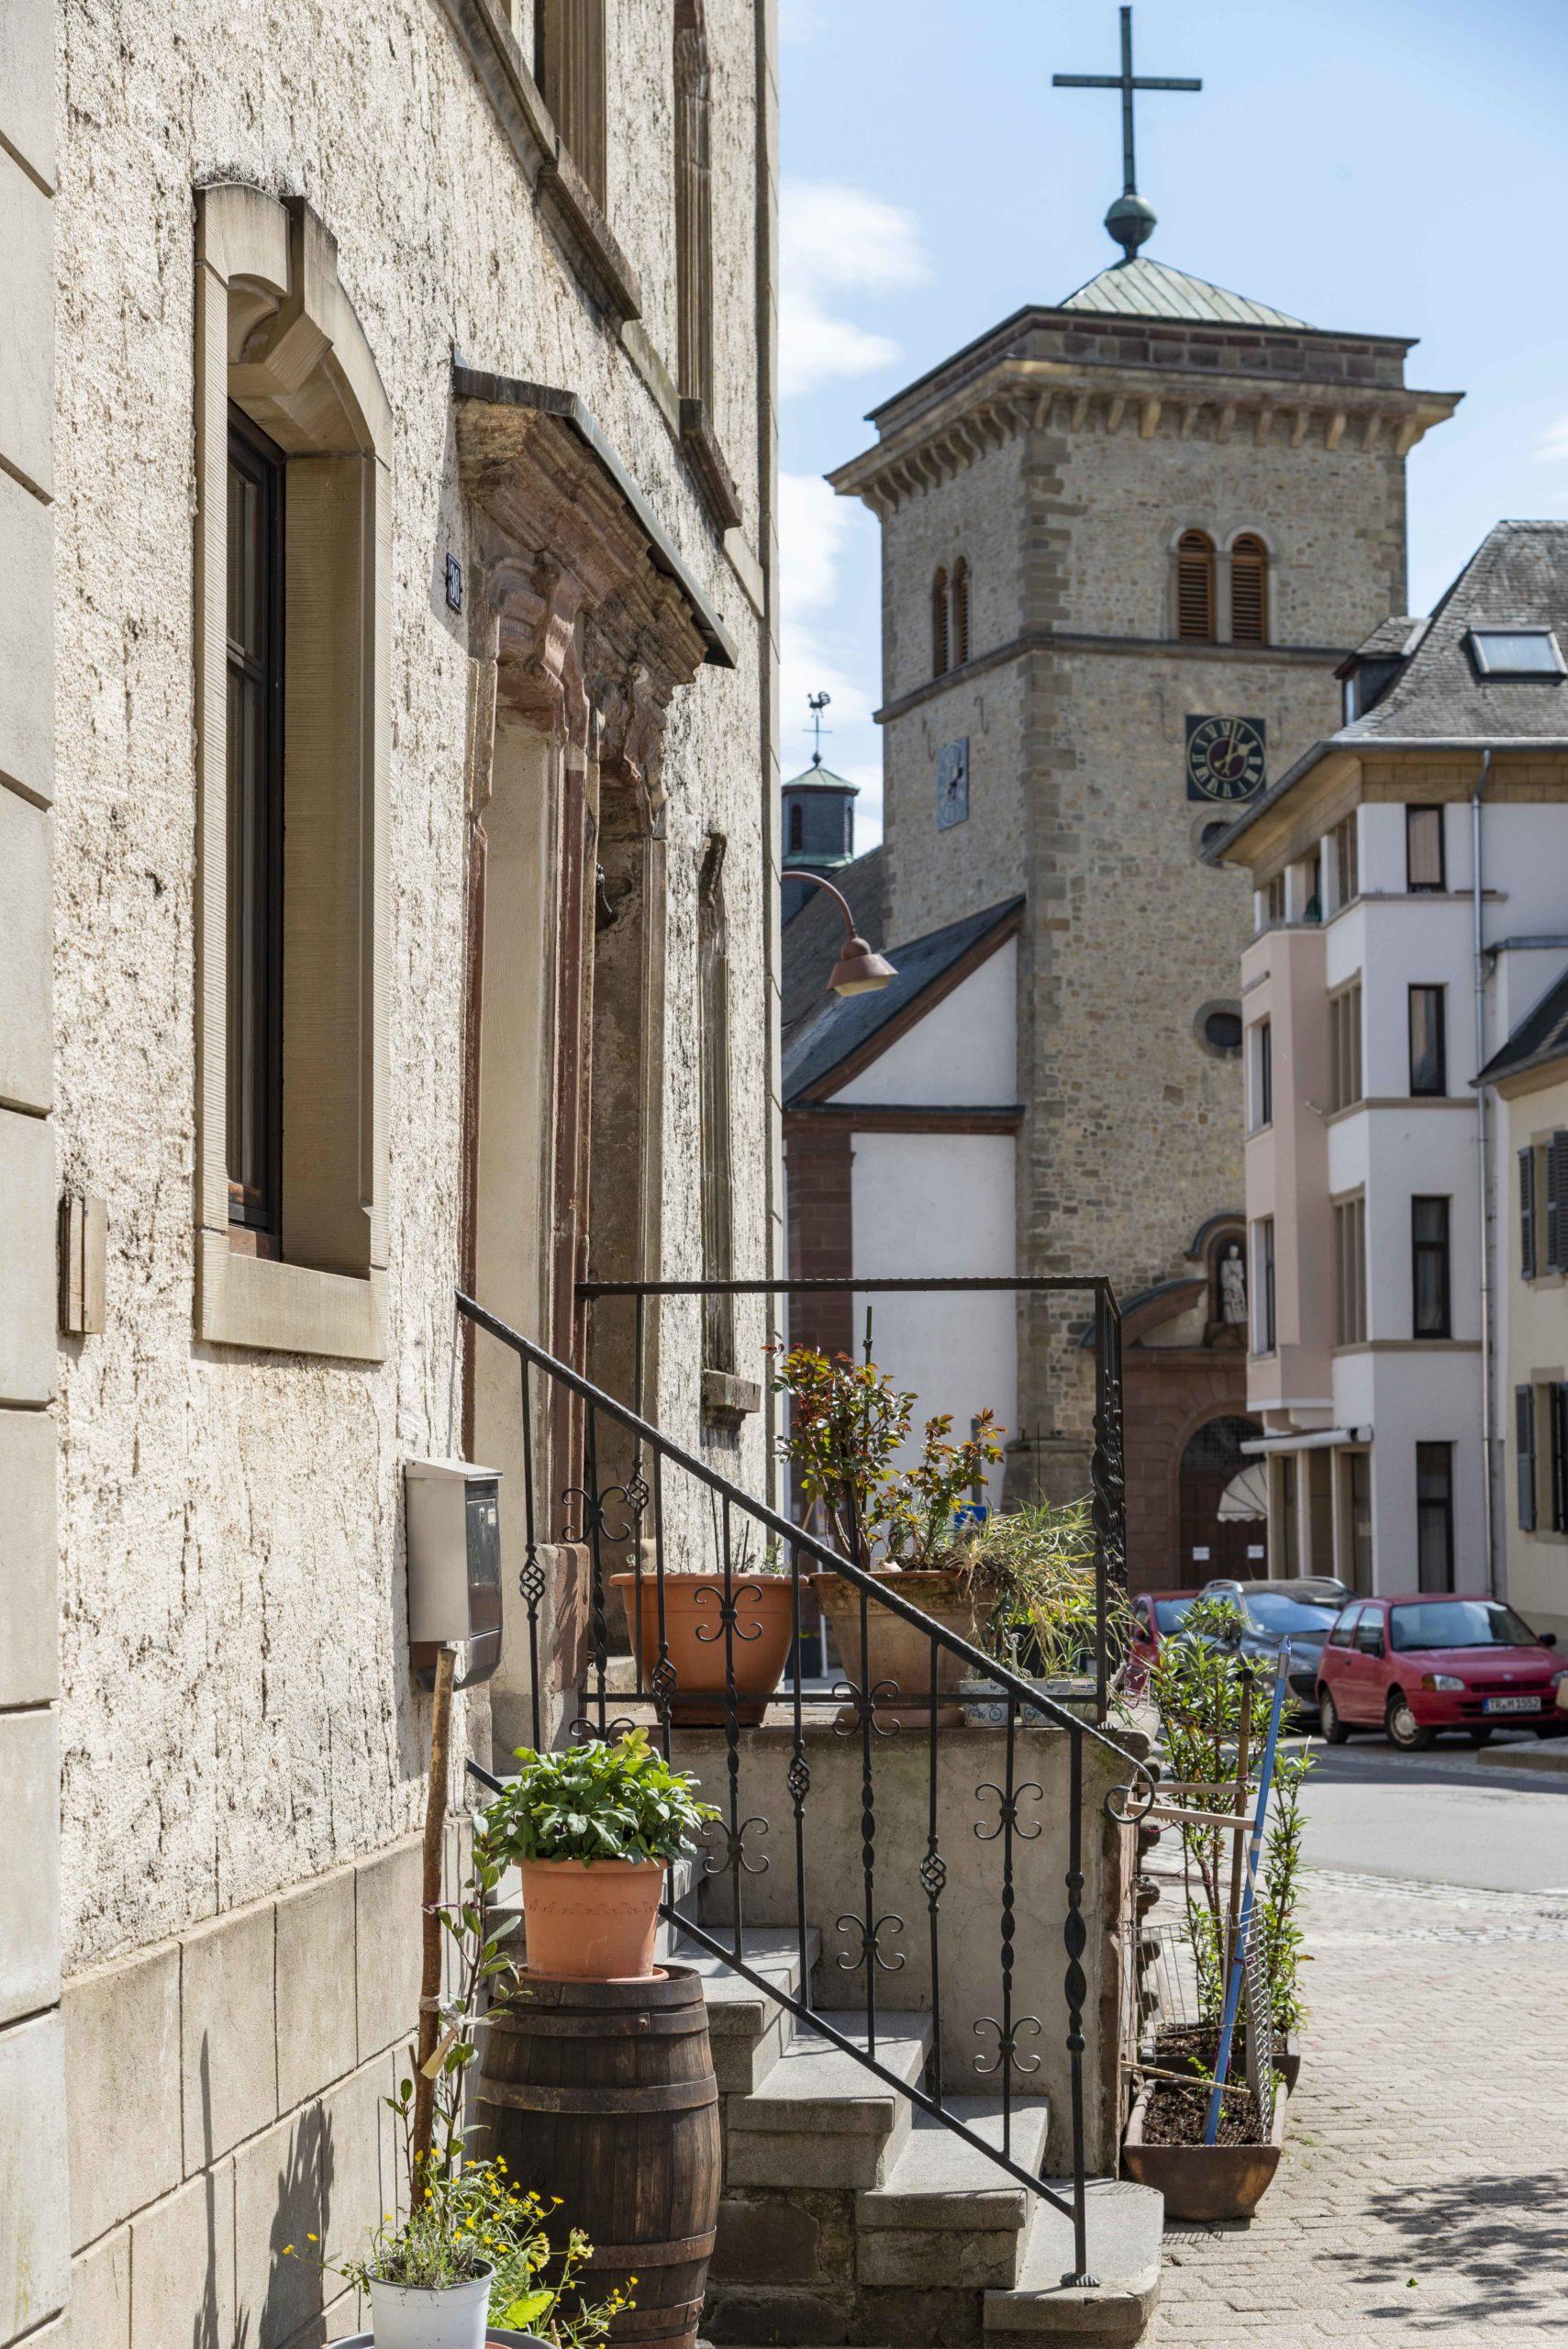 Ortszentrum Grevenmacher